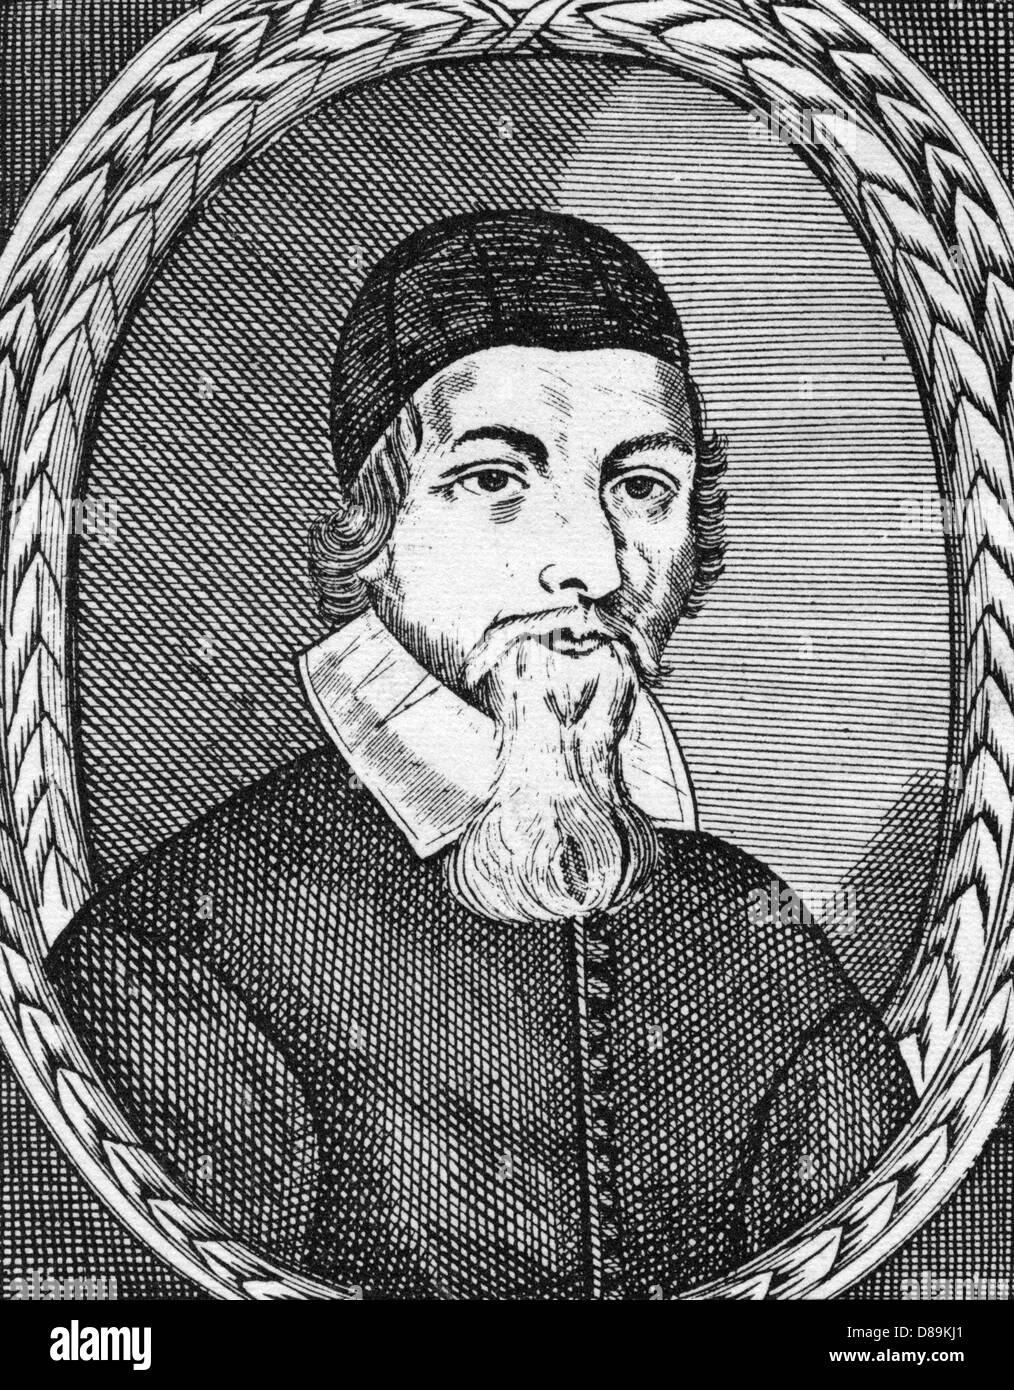 Jan Amos Comenius - Stock Image